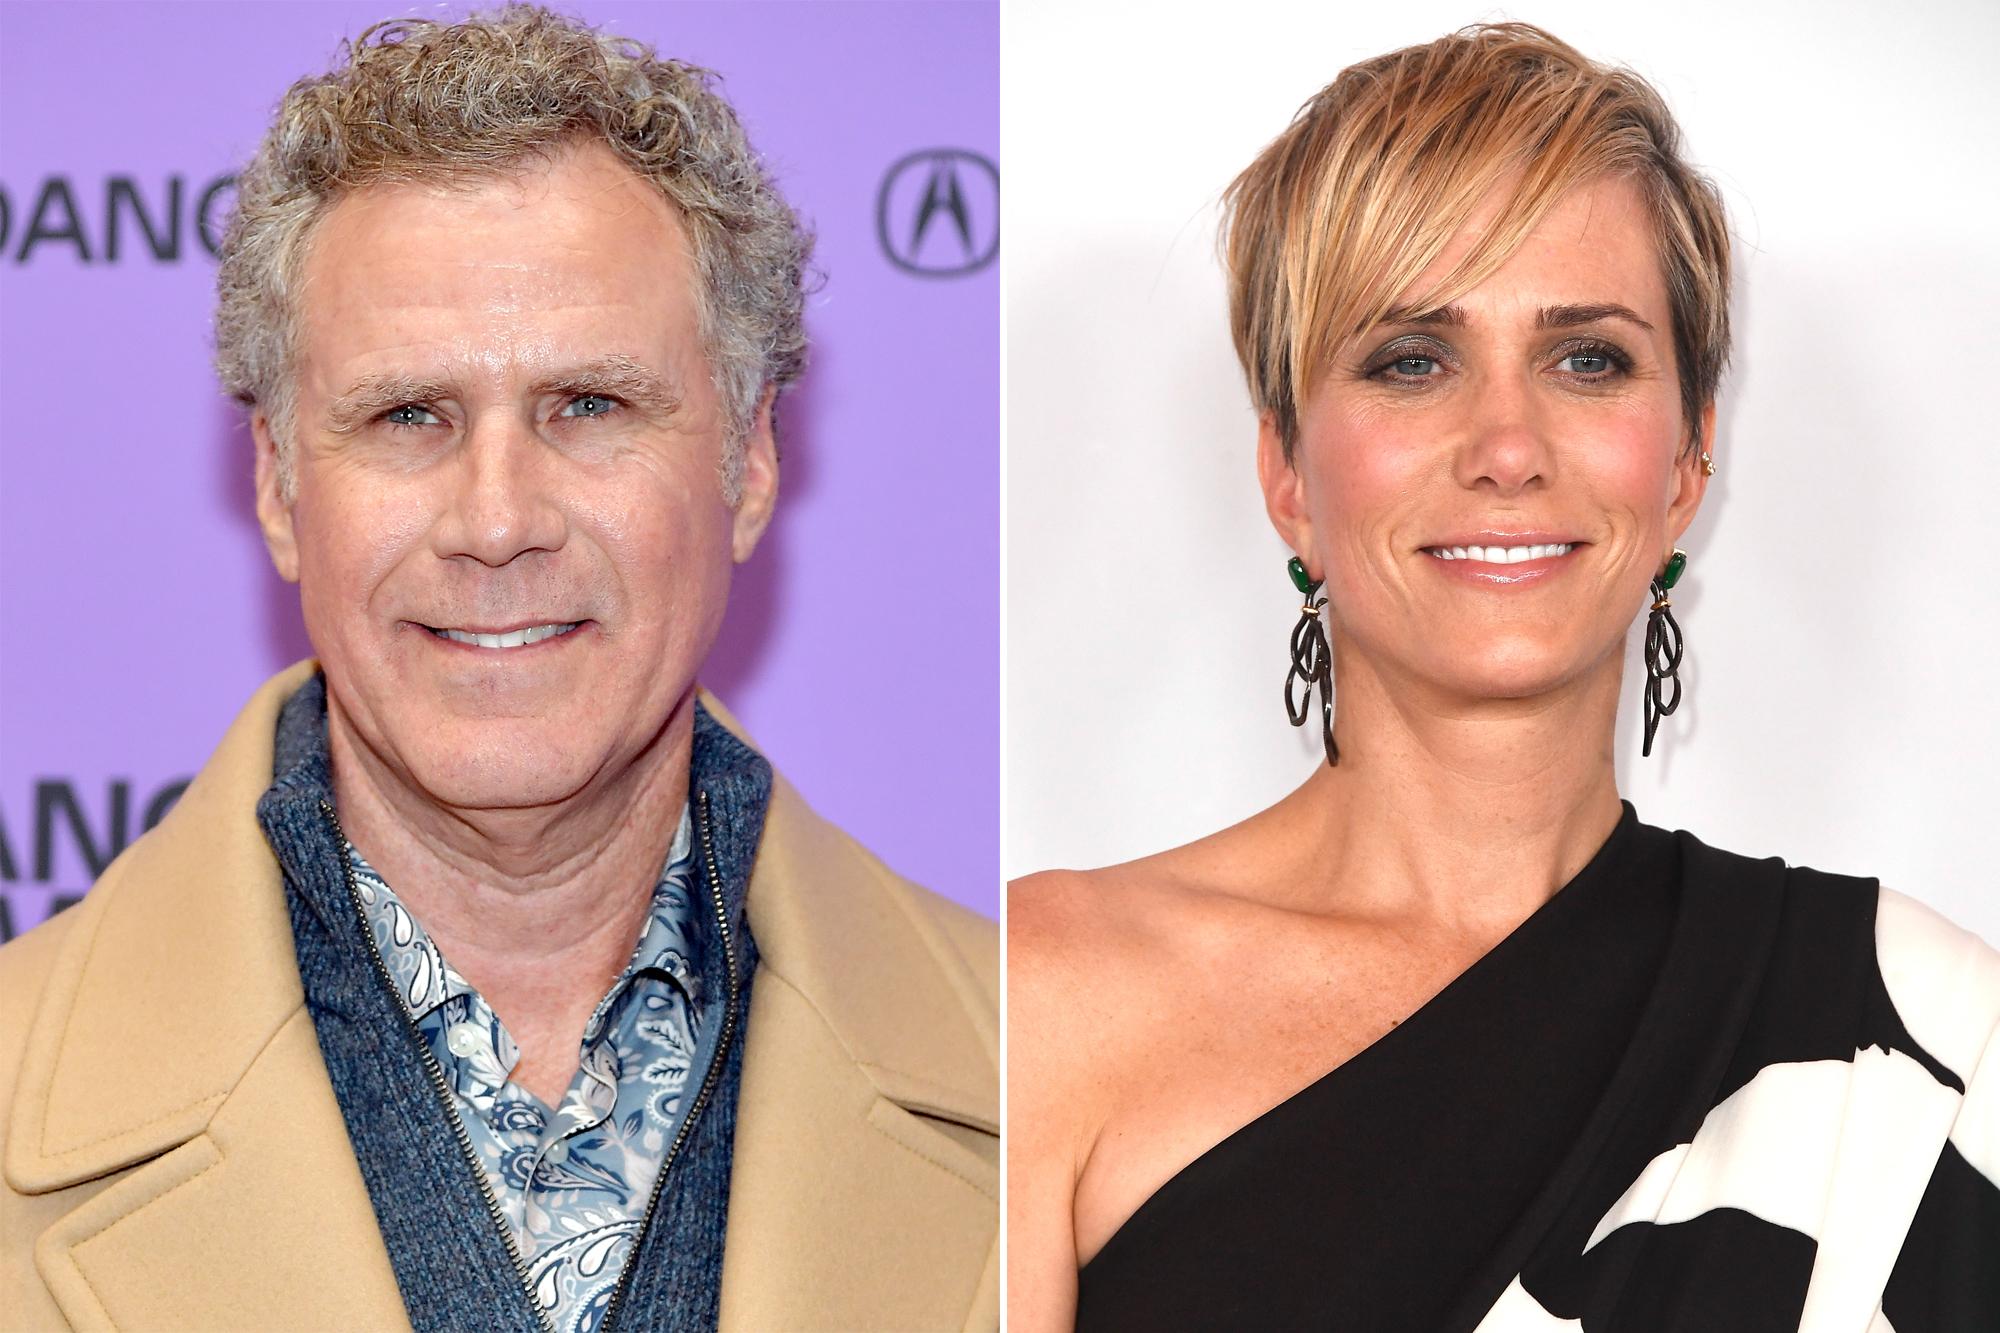 Will Ferrell Christmas 2020 Oscar presenters 2020: Can Will Ferrell and Kristen Wiig make host